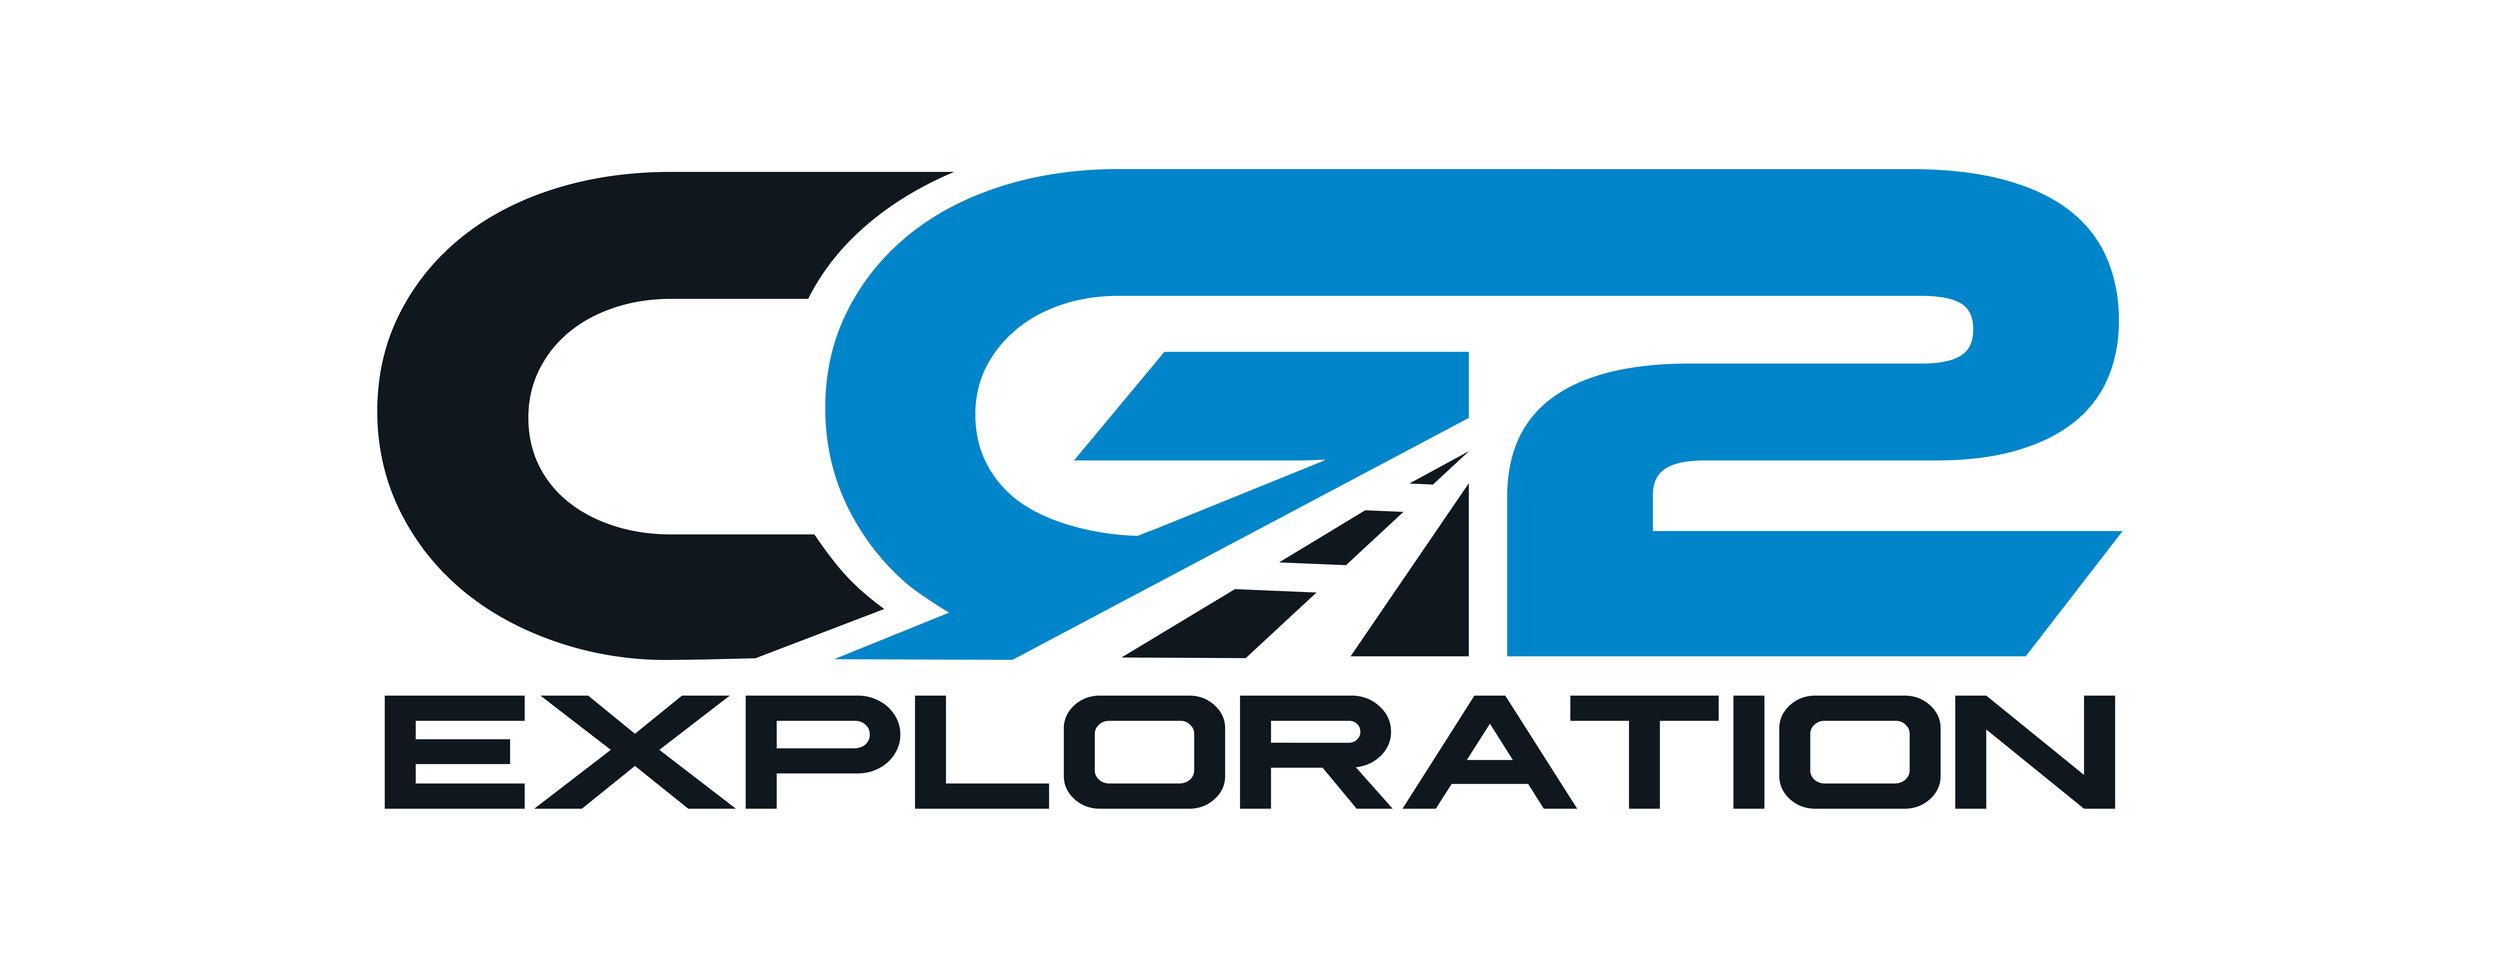 CG2-Expl-PLCC.jpg